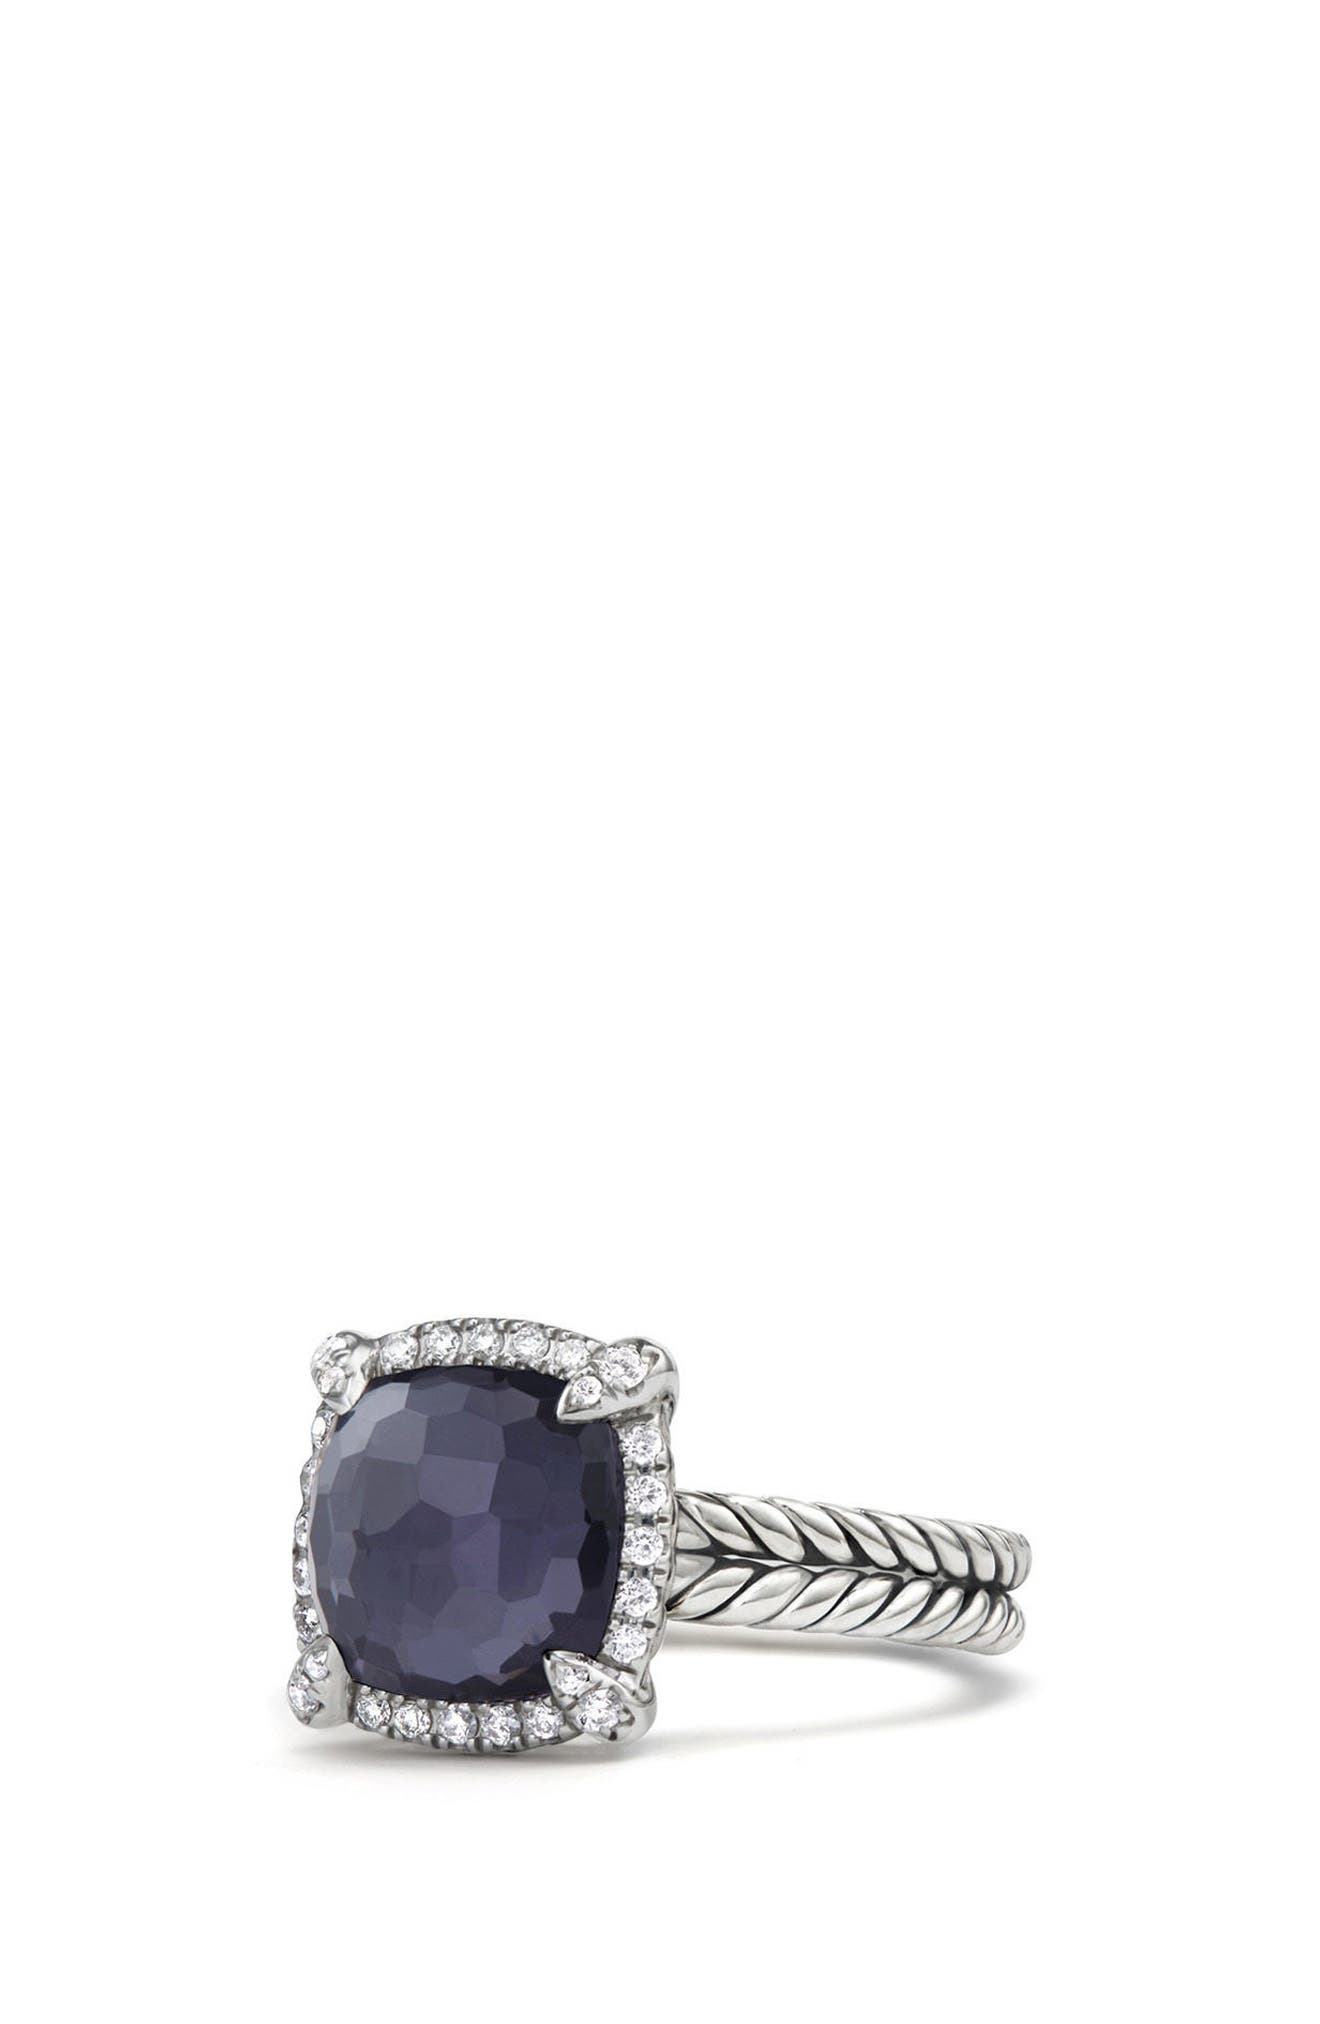 Châtelaine Pavé Bezel Ring with Black Orchid & Diamonds, 9mm,                         Main,                         color, 509